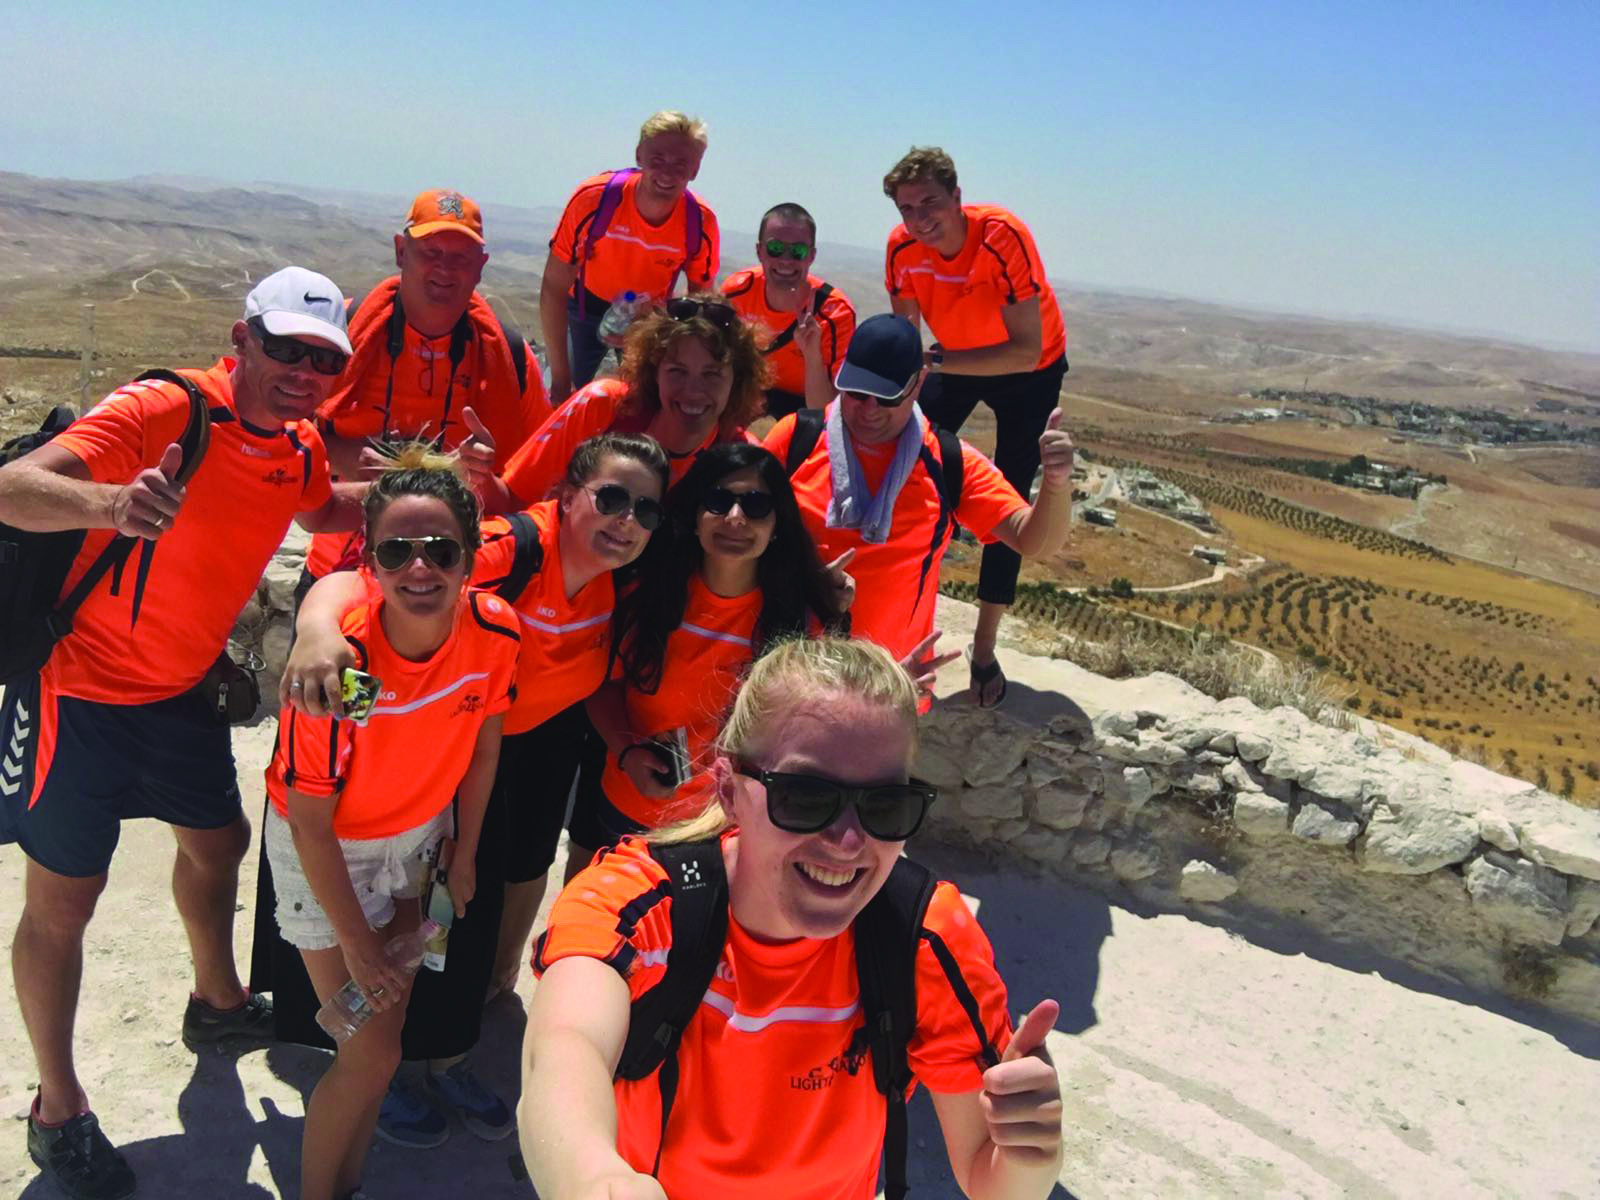 Explore Israël Zomer Jongerenreis 2019